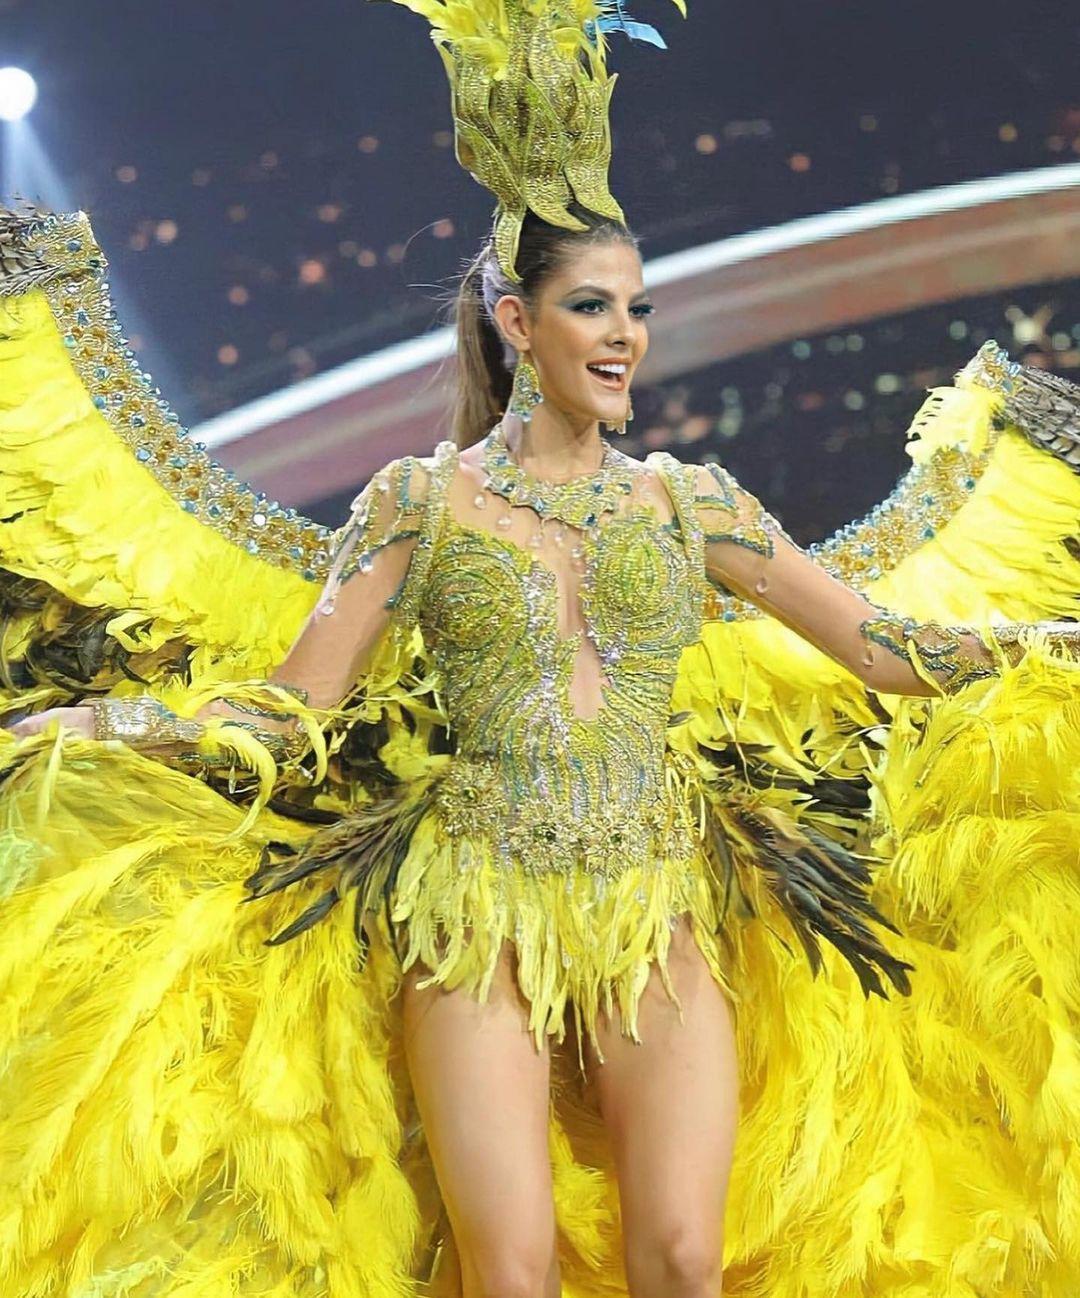 natalia manrique, miss grand colombia 2020. - Página 13 16405510